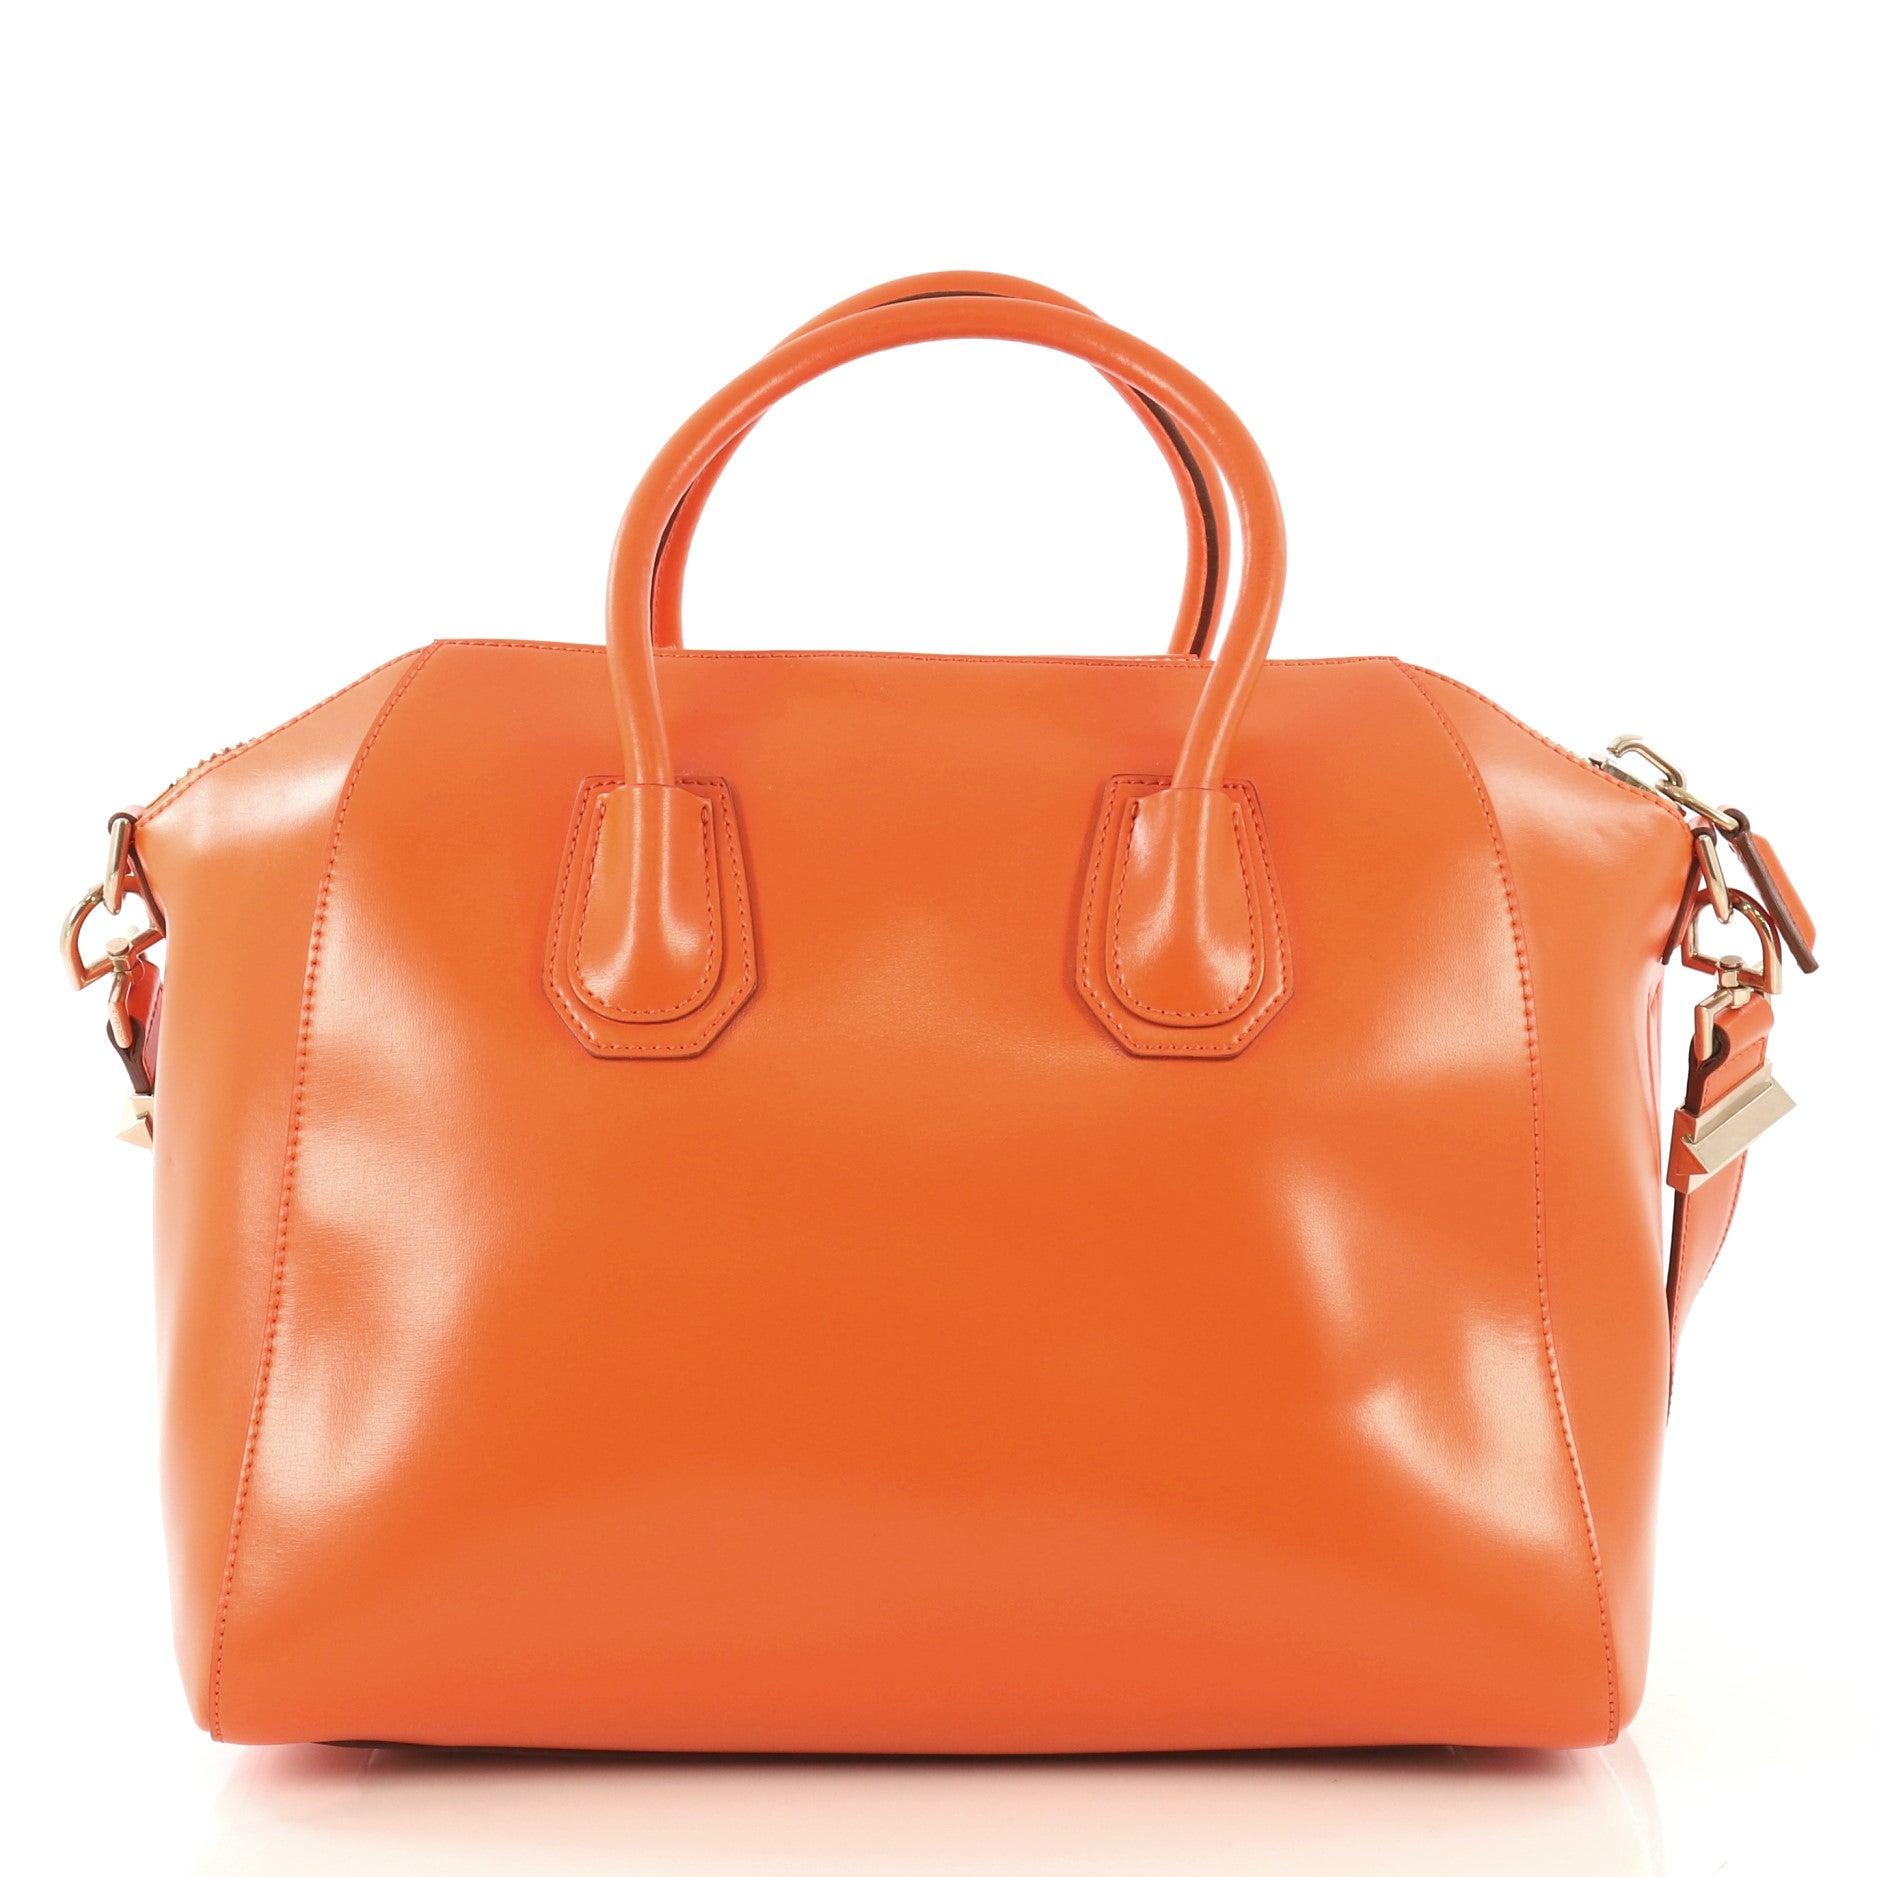 14064e209d5 Givenchy Antigona Bag Leather Medium For Sale at 1stdibs